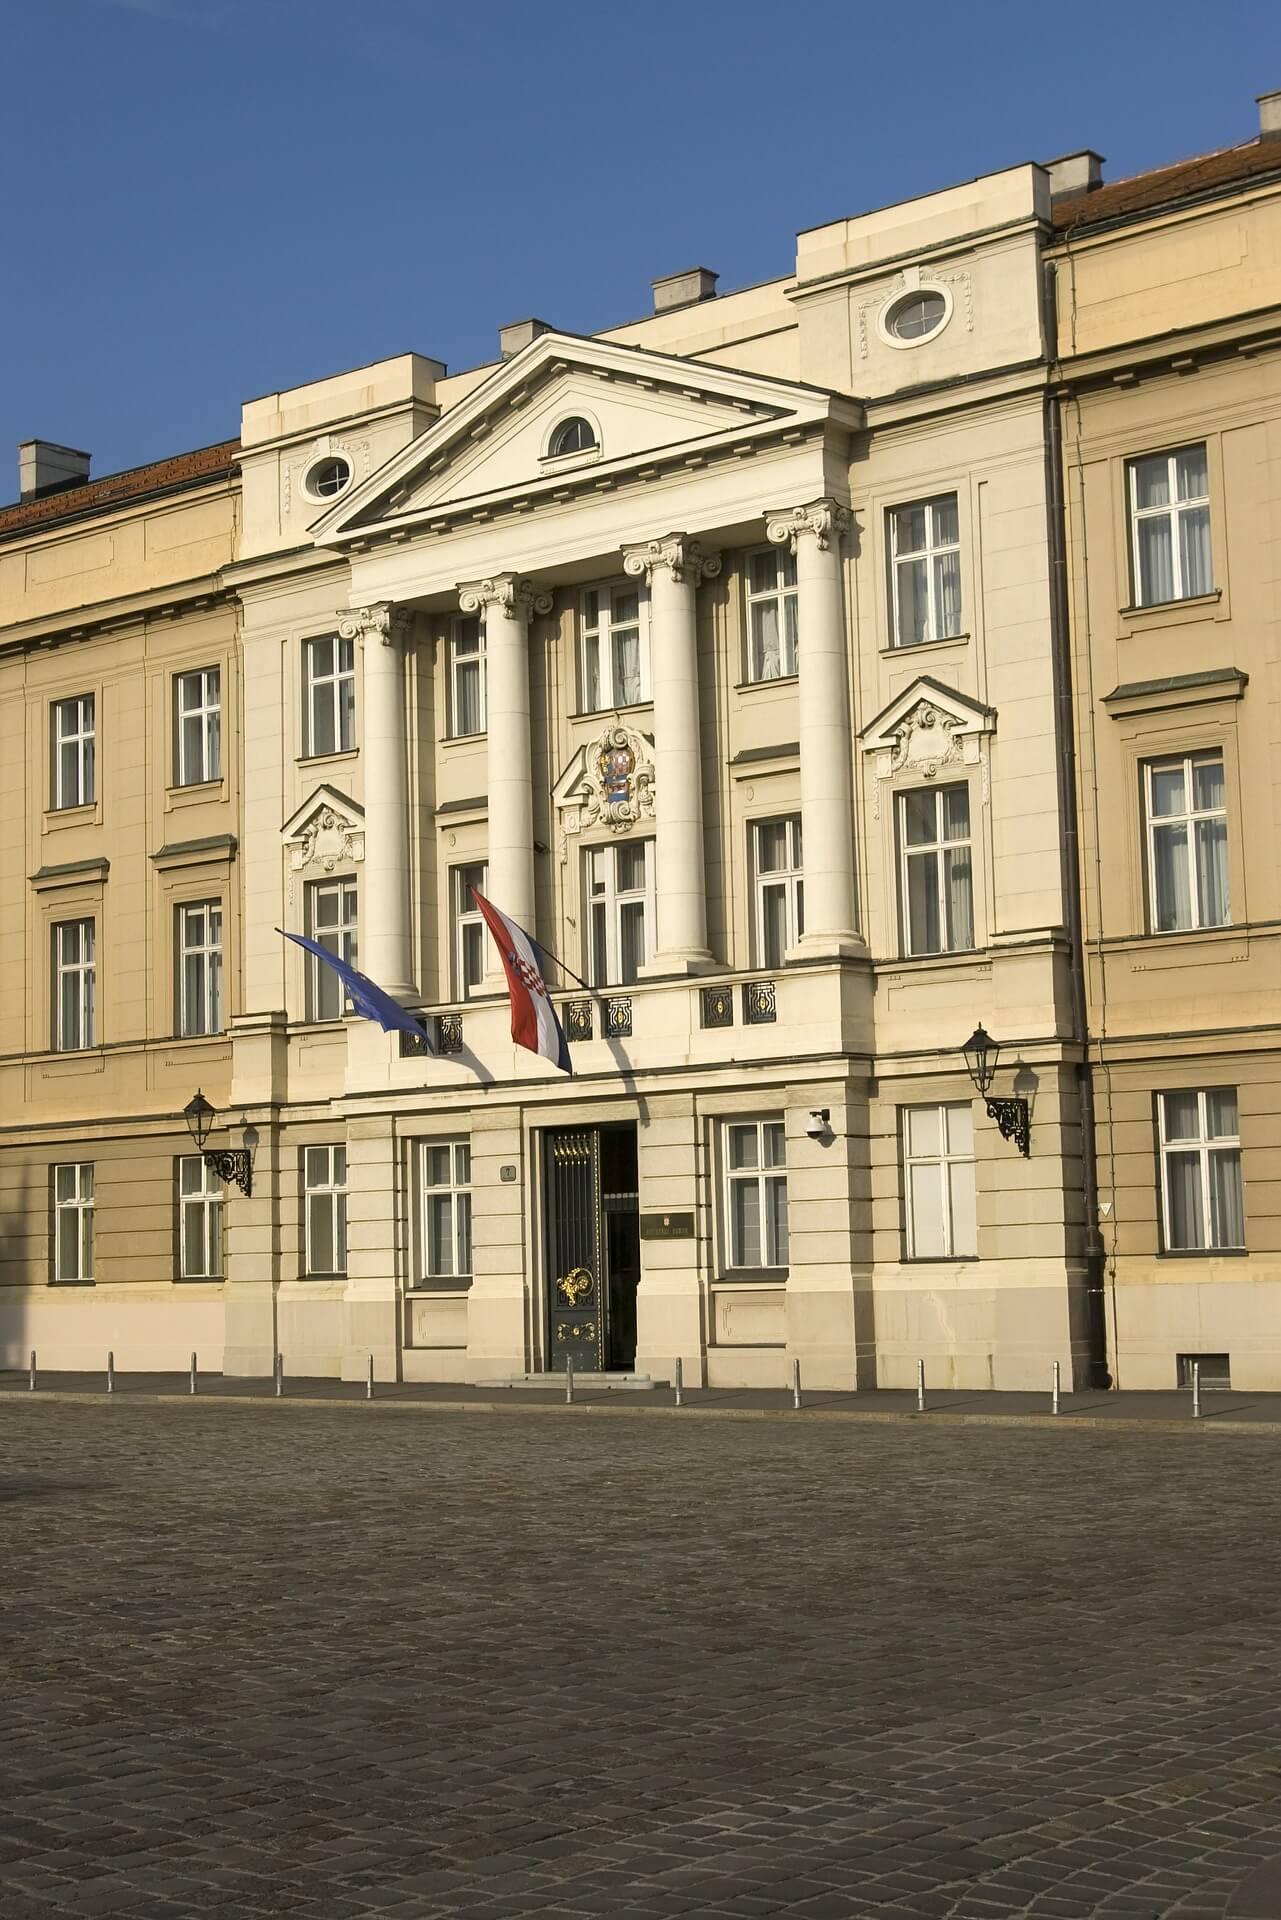 The Croatian Parliament in Zagreb.